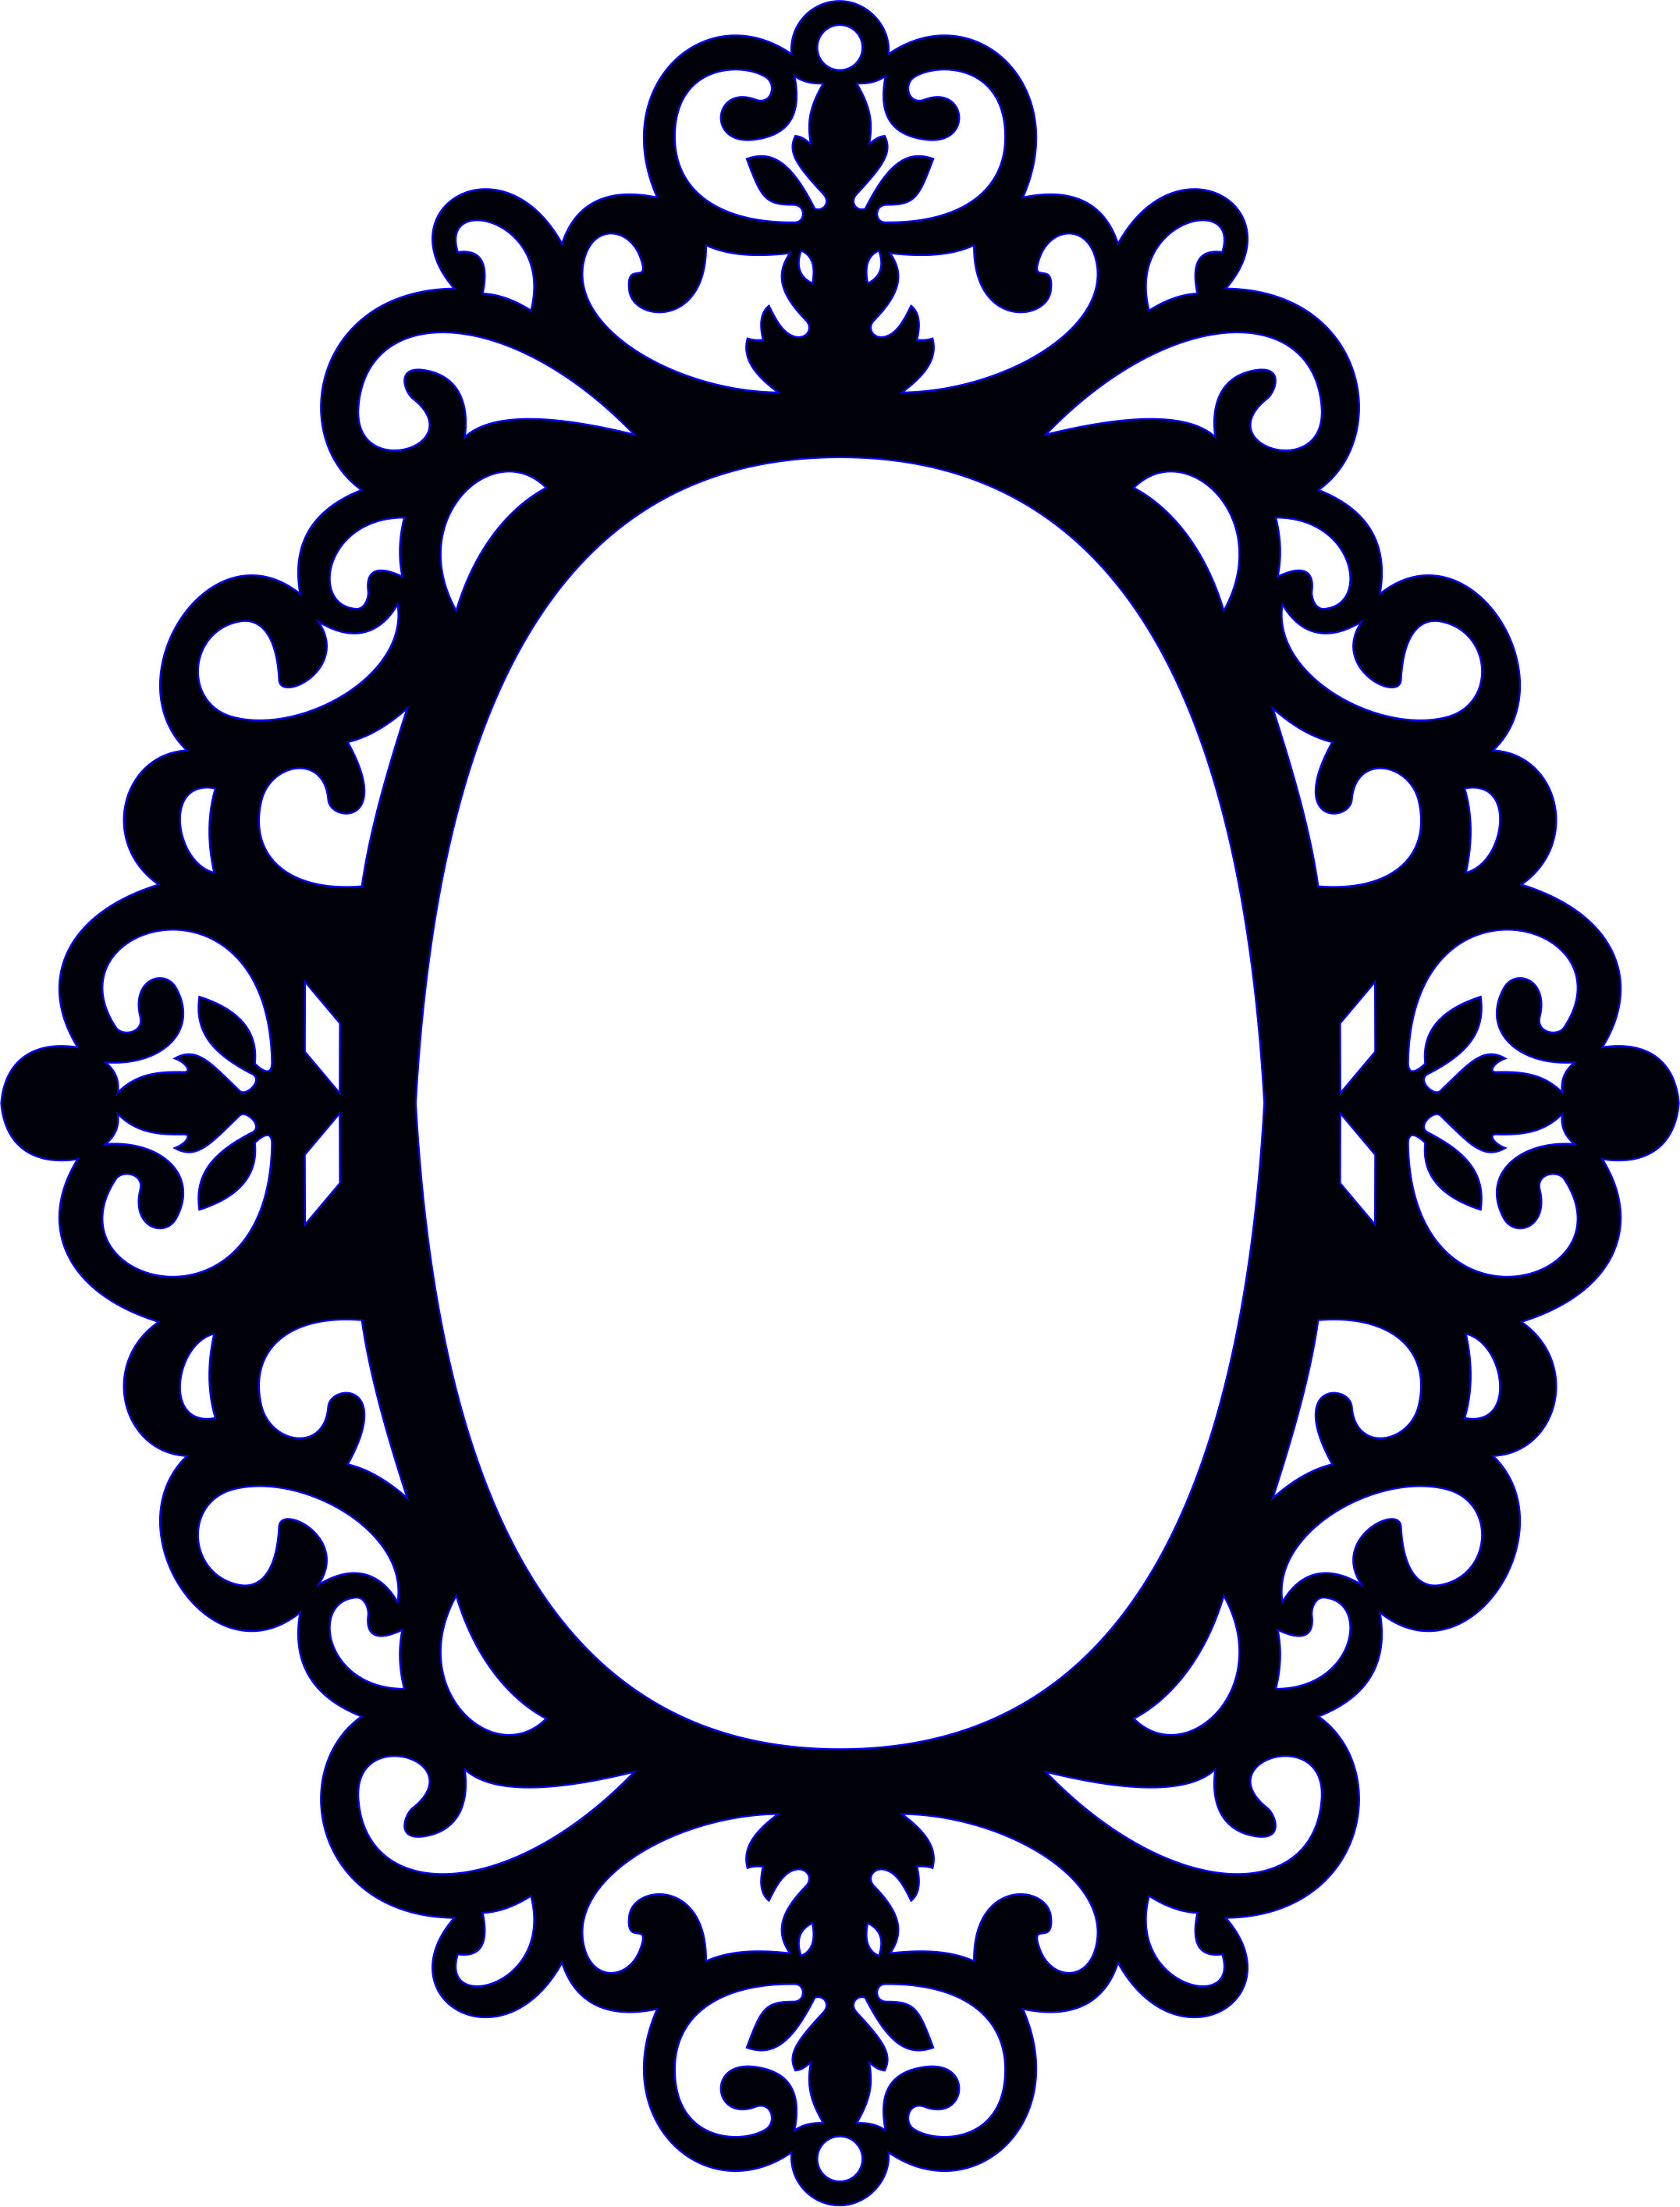 Pin de Pavel en Рамки для зеркал | Pinterest | Marcos, Marcos de ...